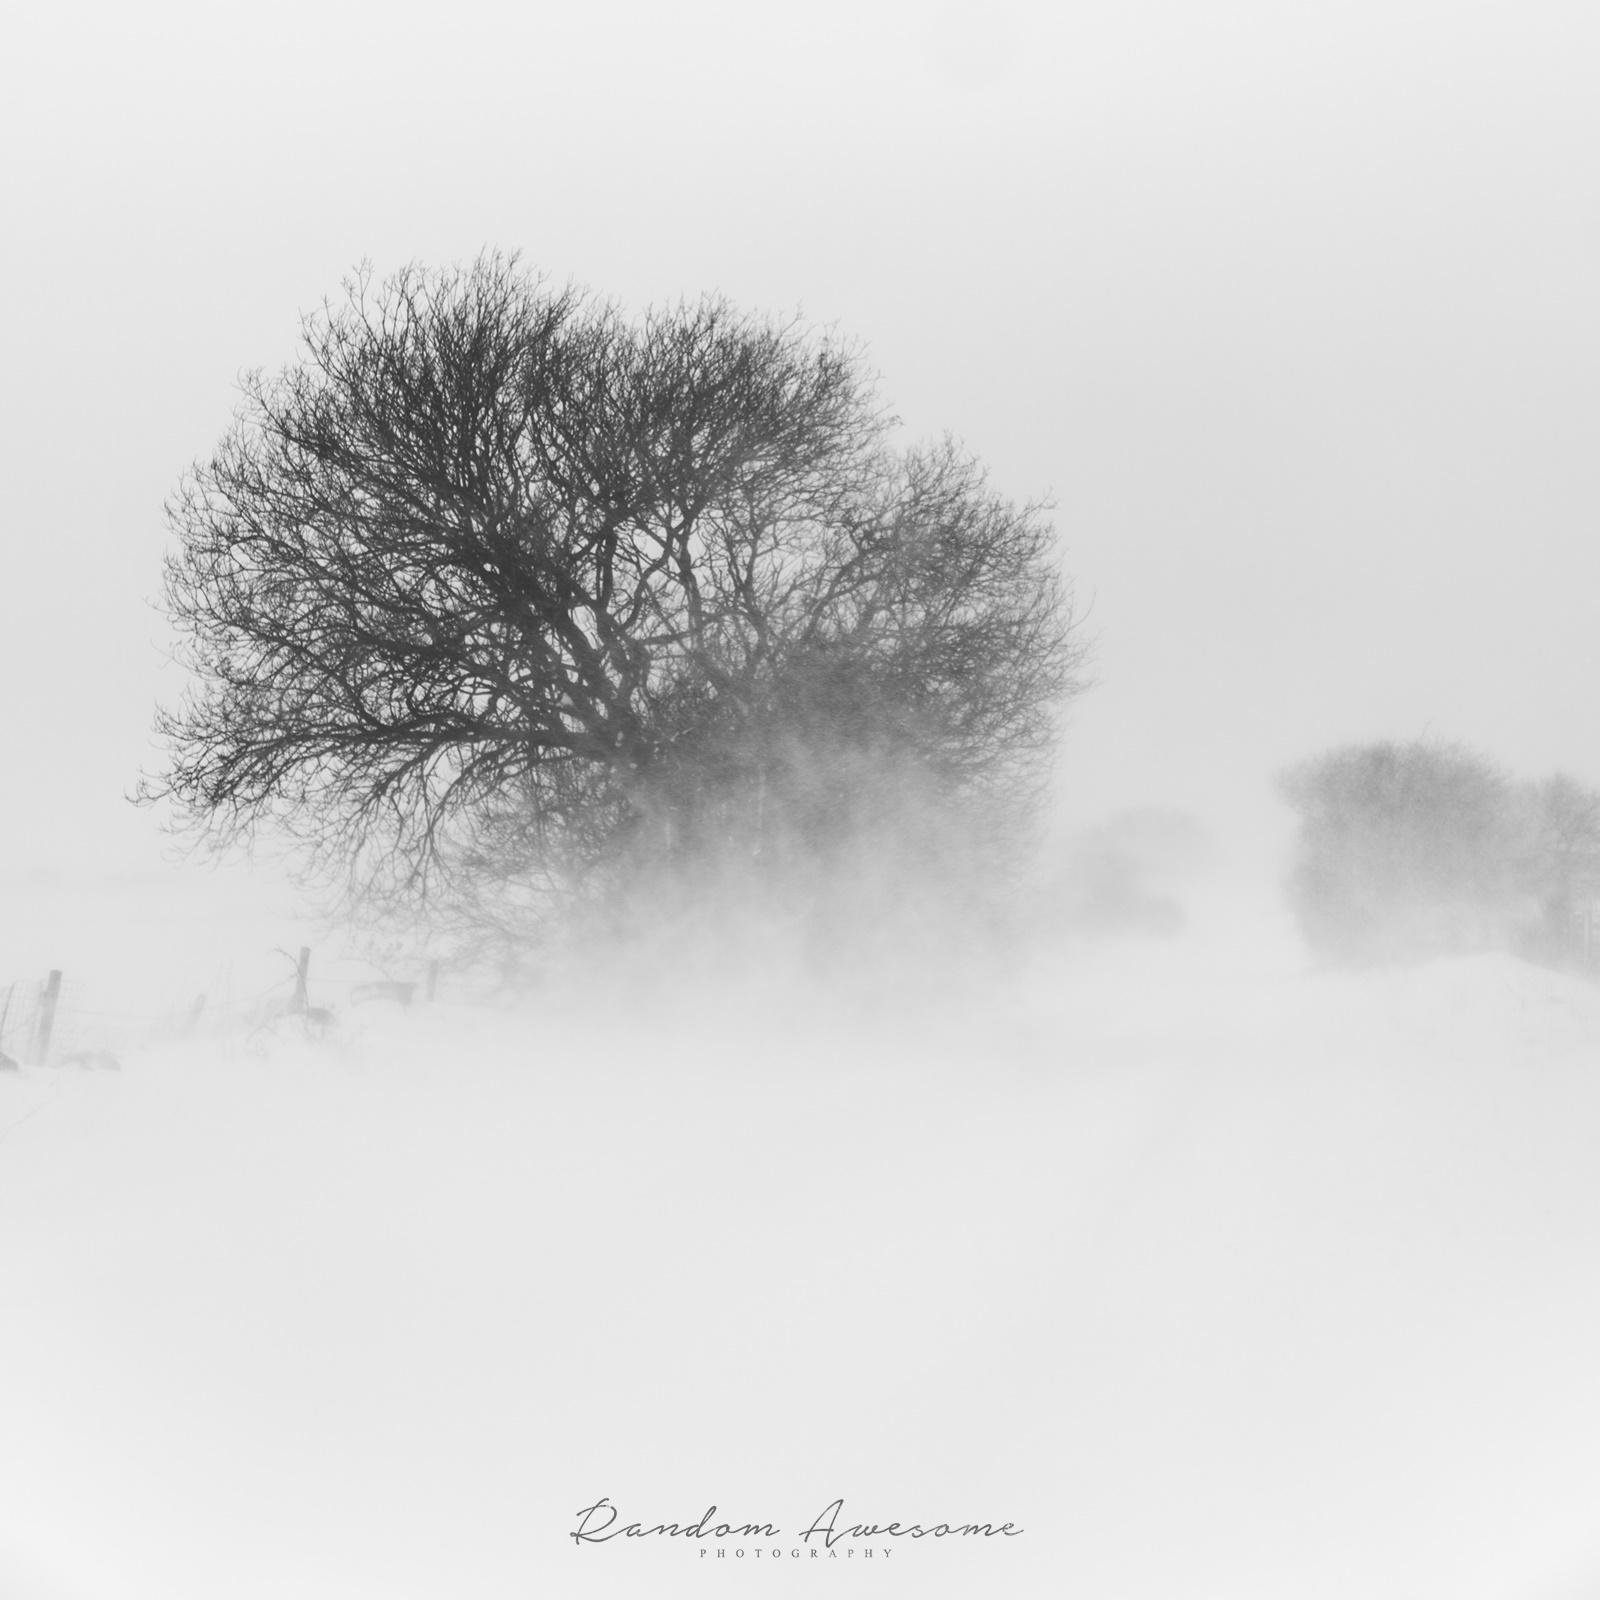 snow walk-13 SMALL SQuare.jpg